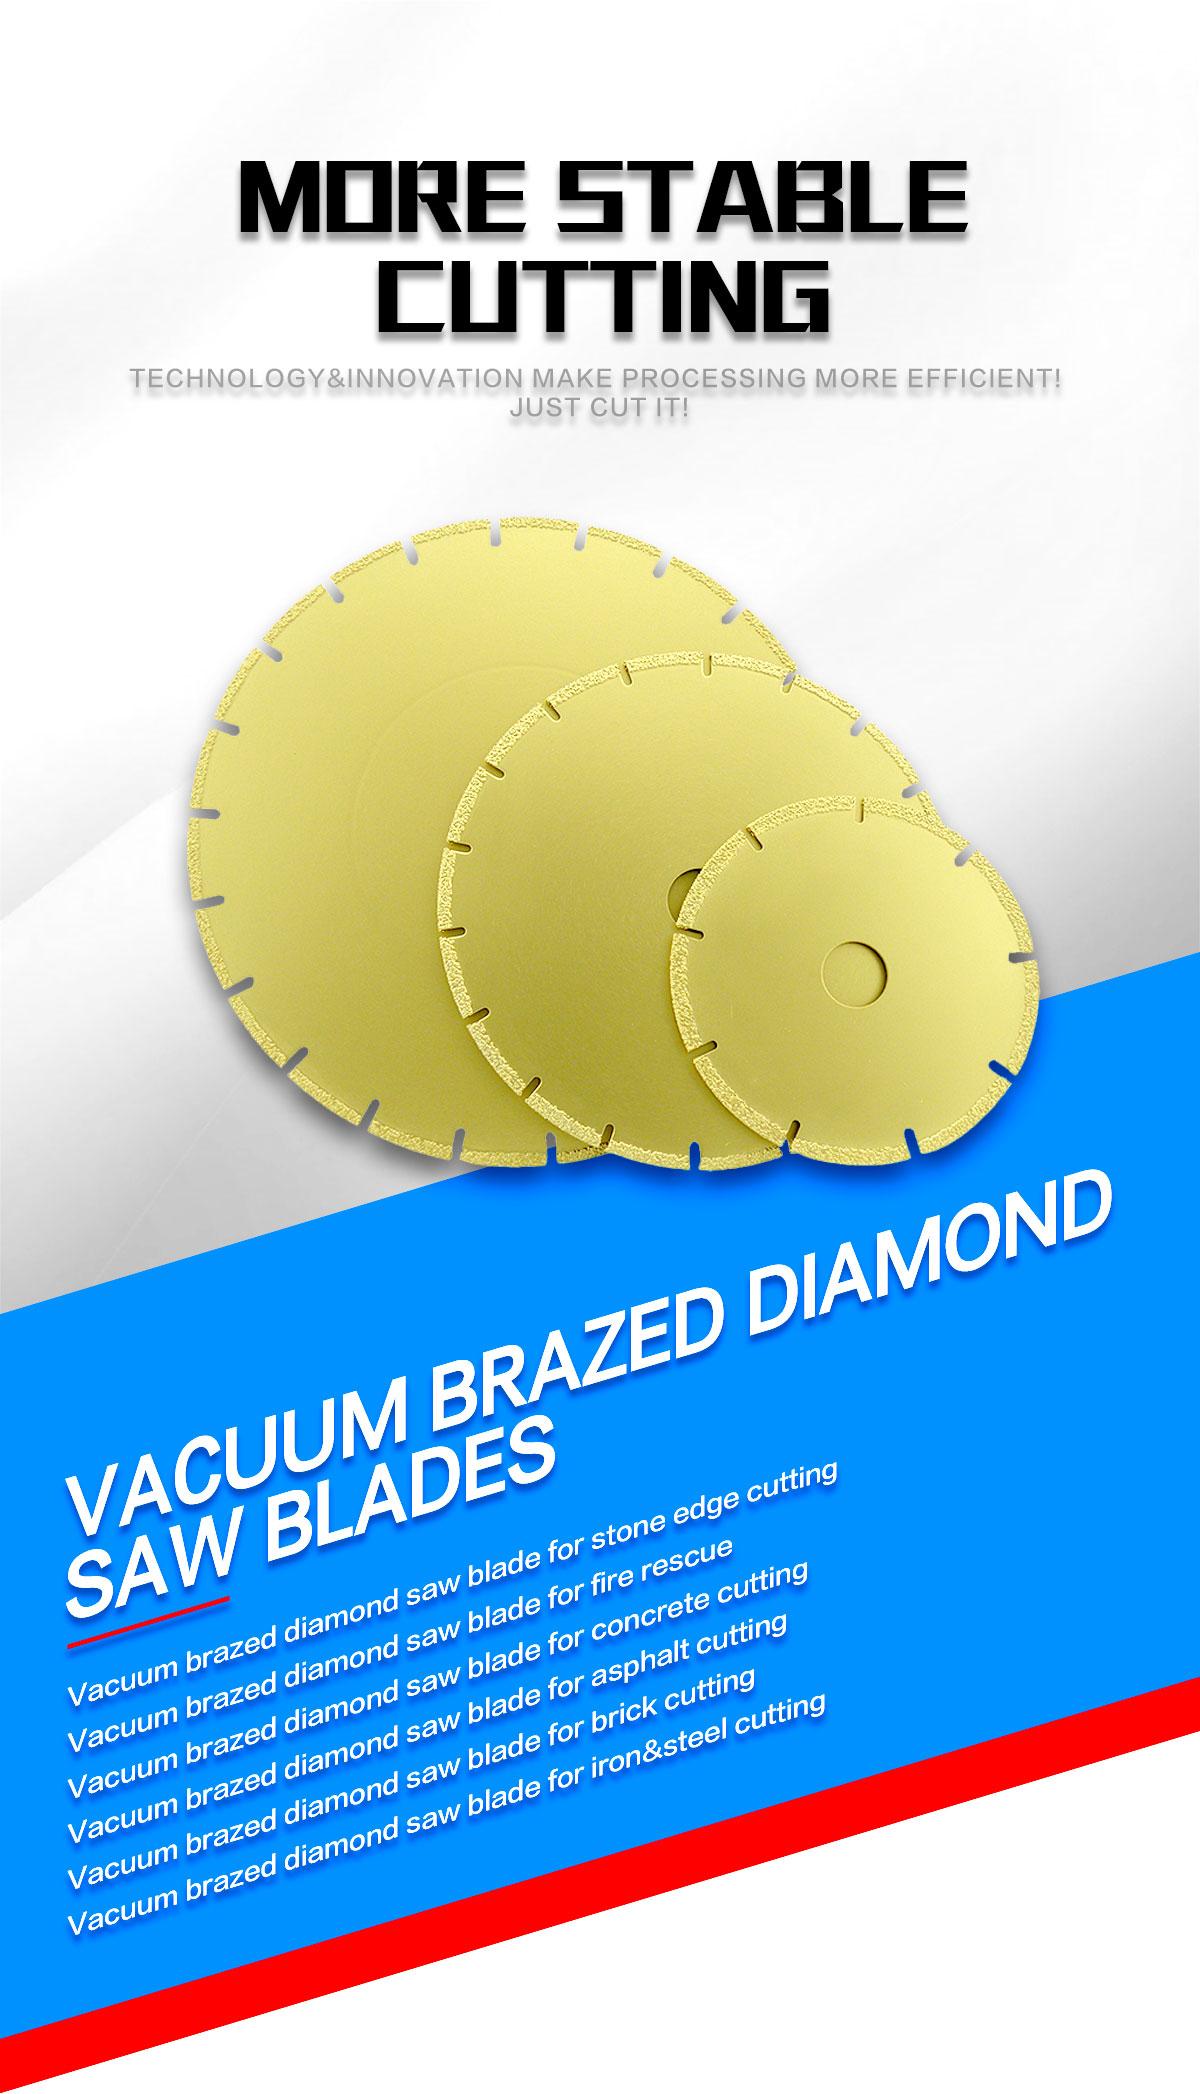 vacuum brazed diamond saw blade